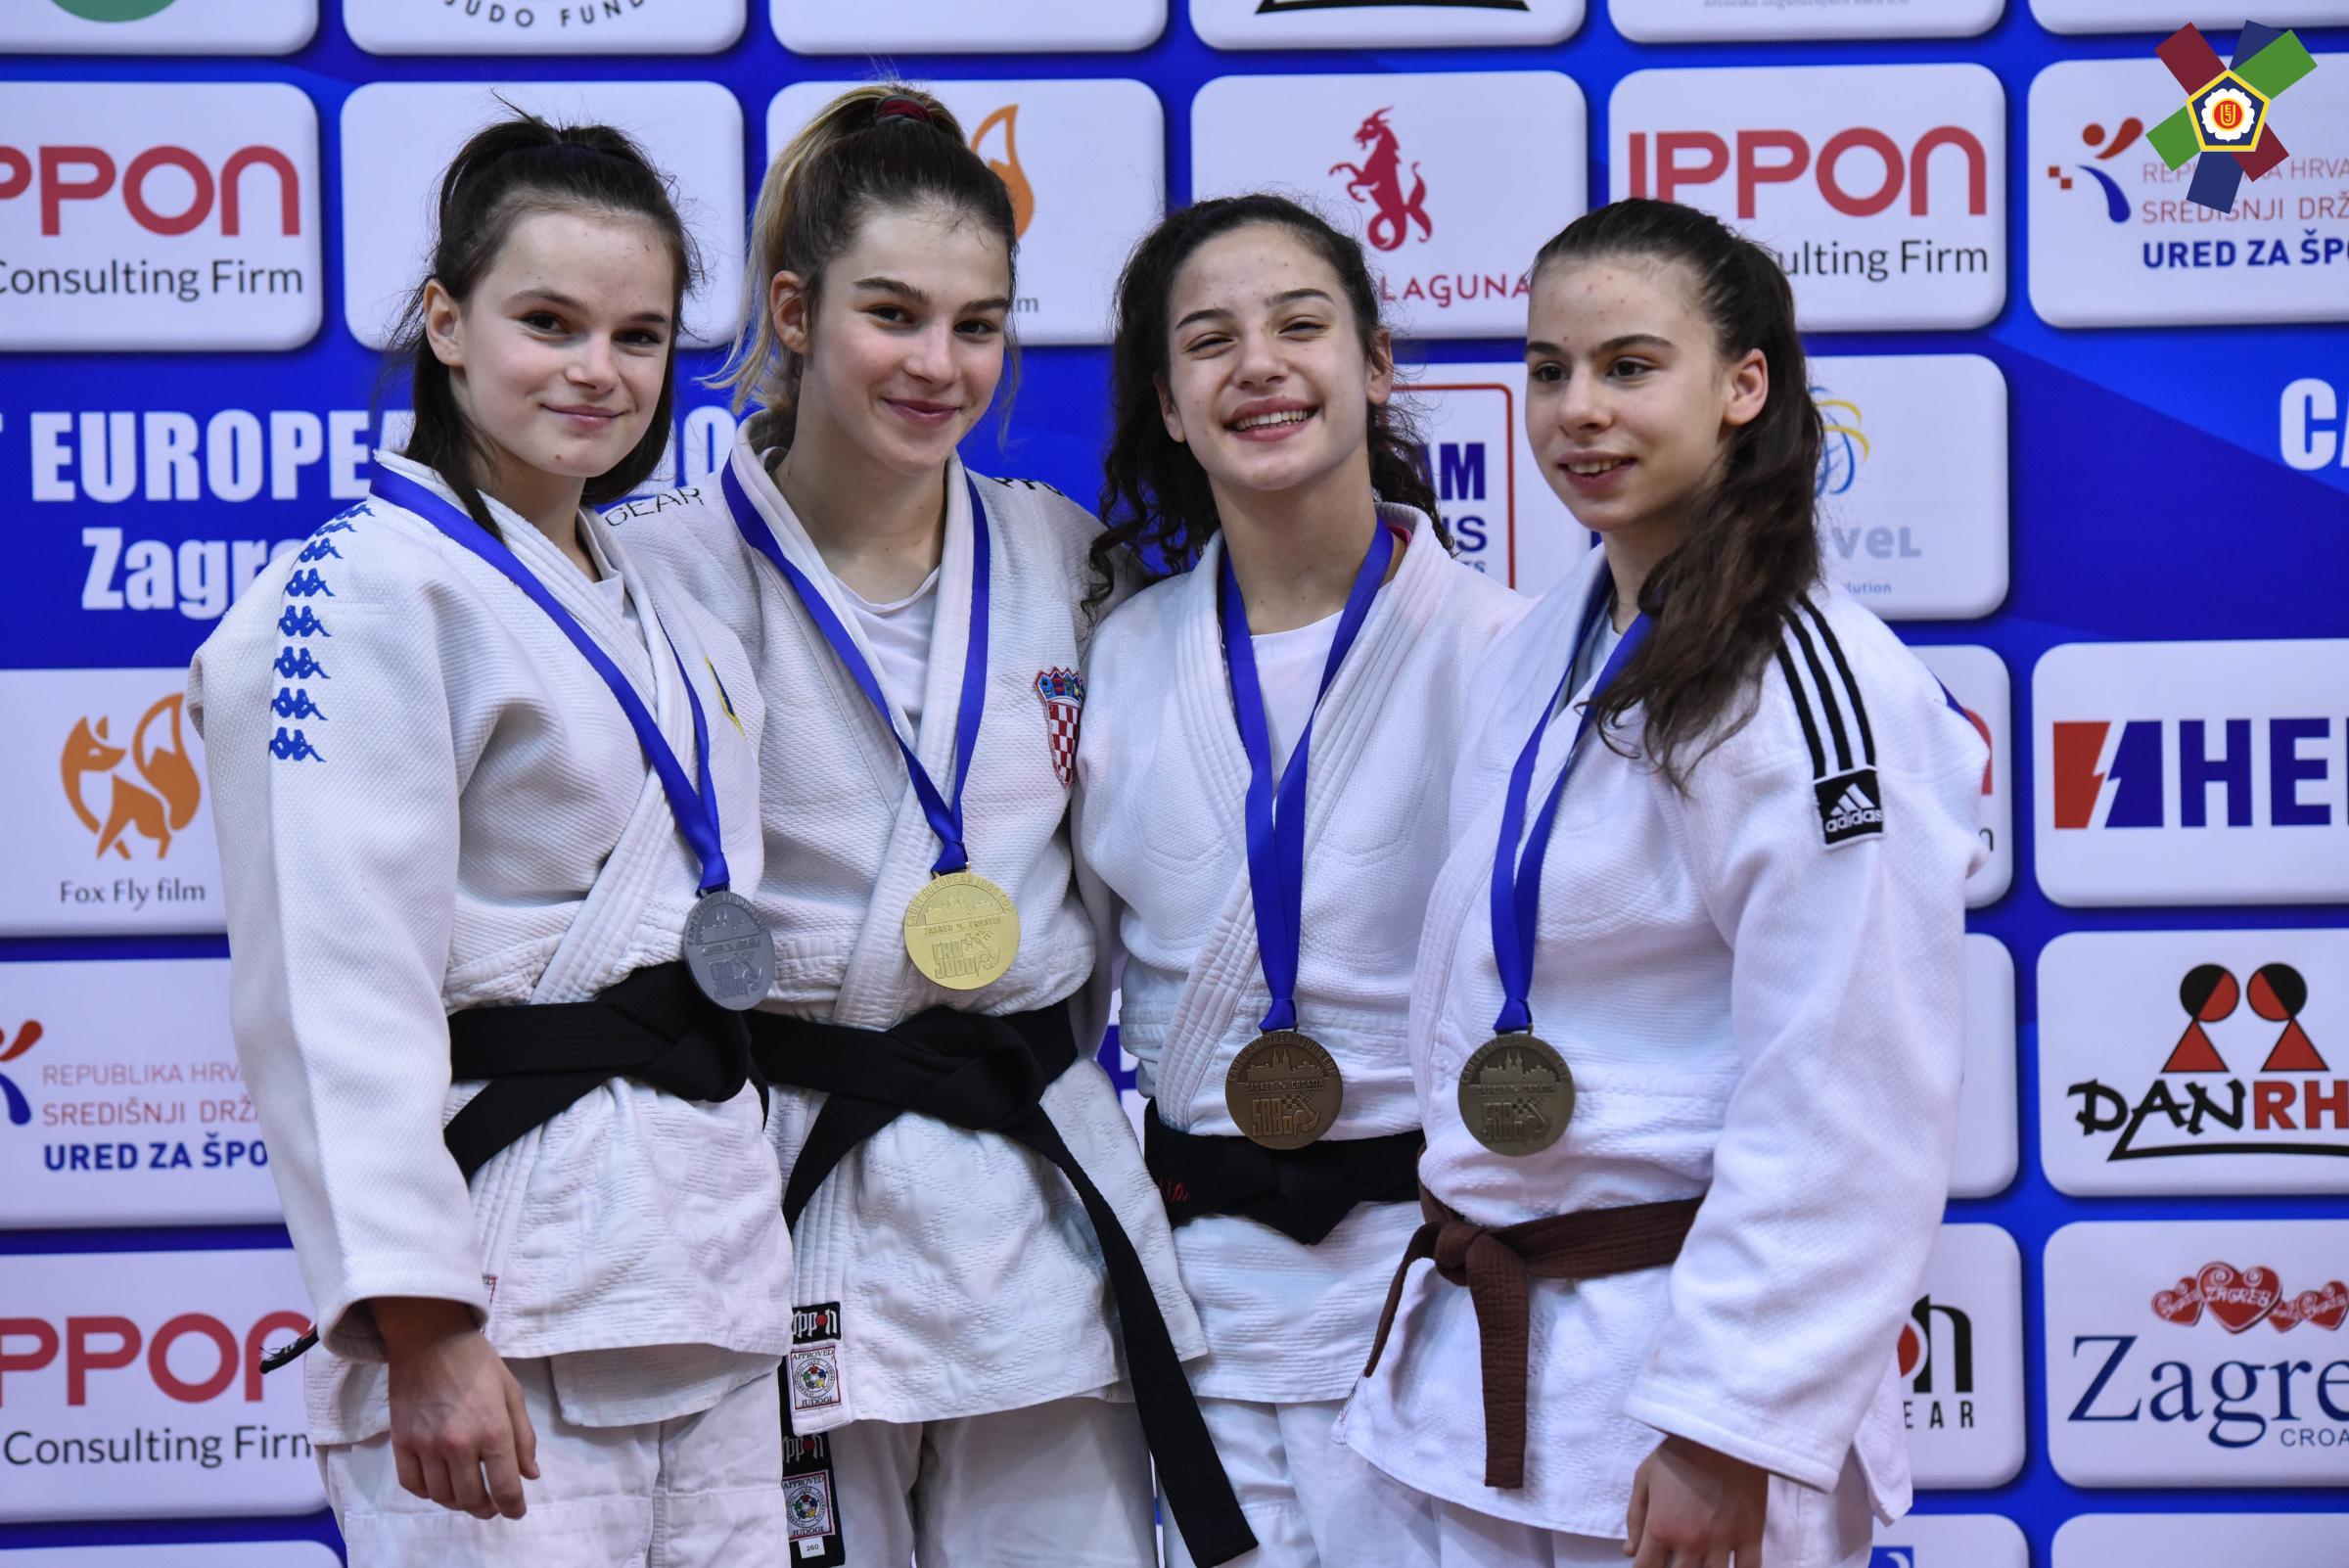 EJU-Judo-European-Cadet-Cup-Zagreb-2019-Puljiz-2